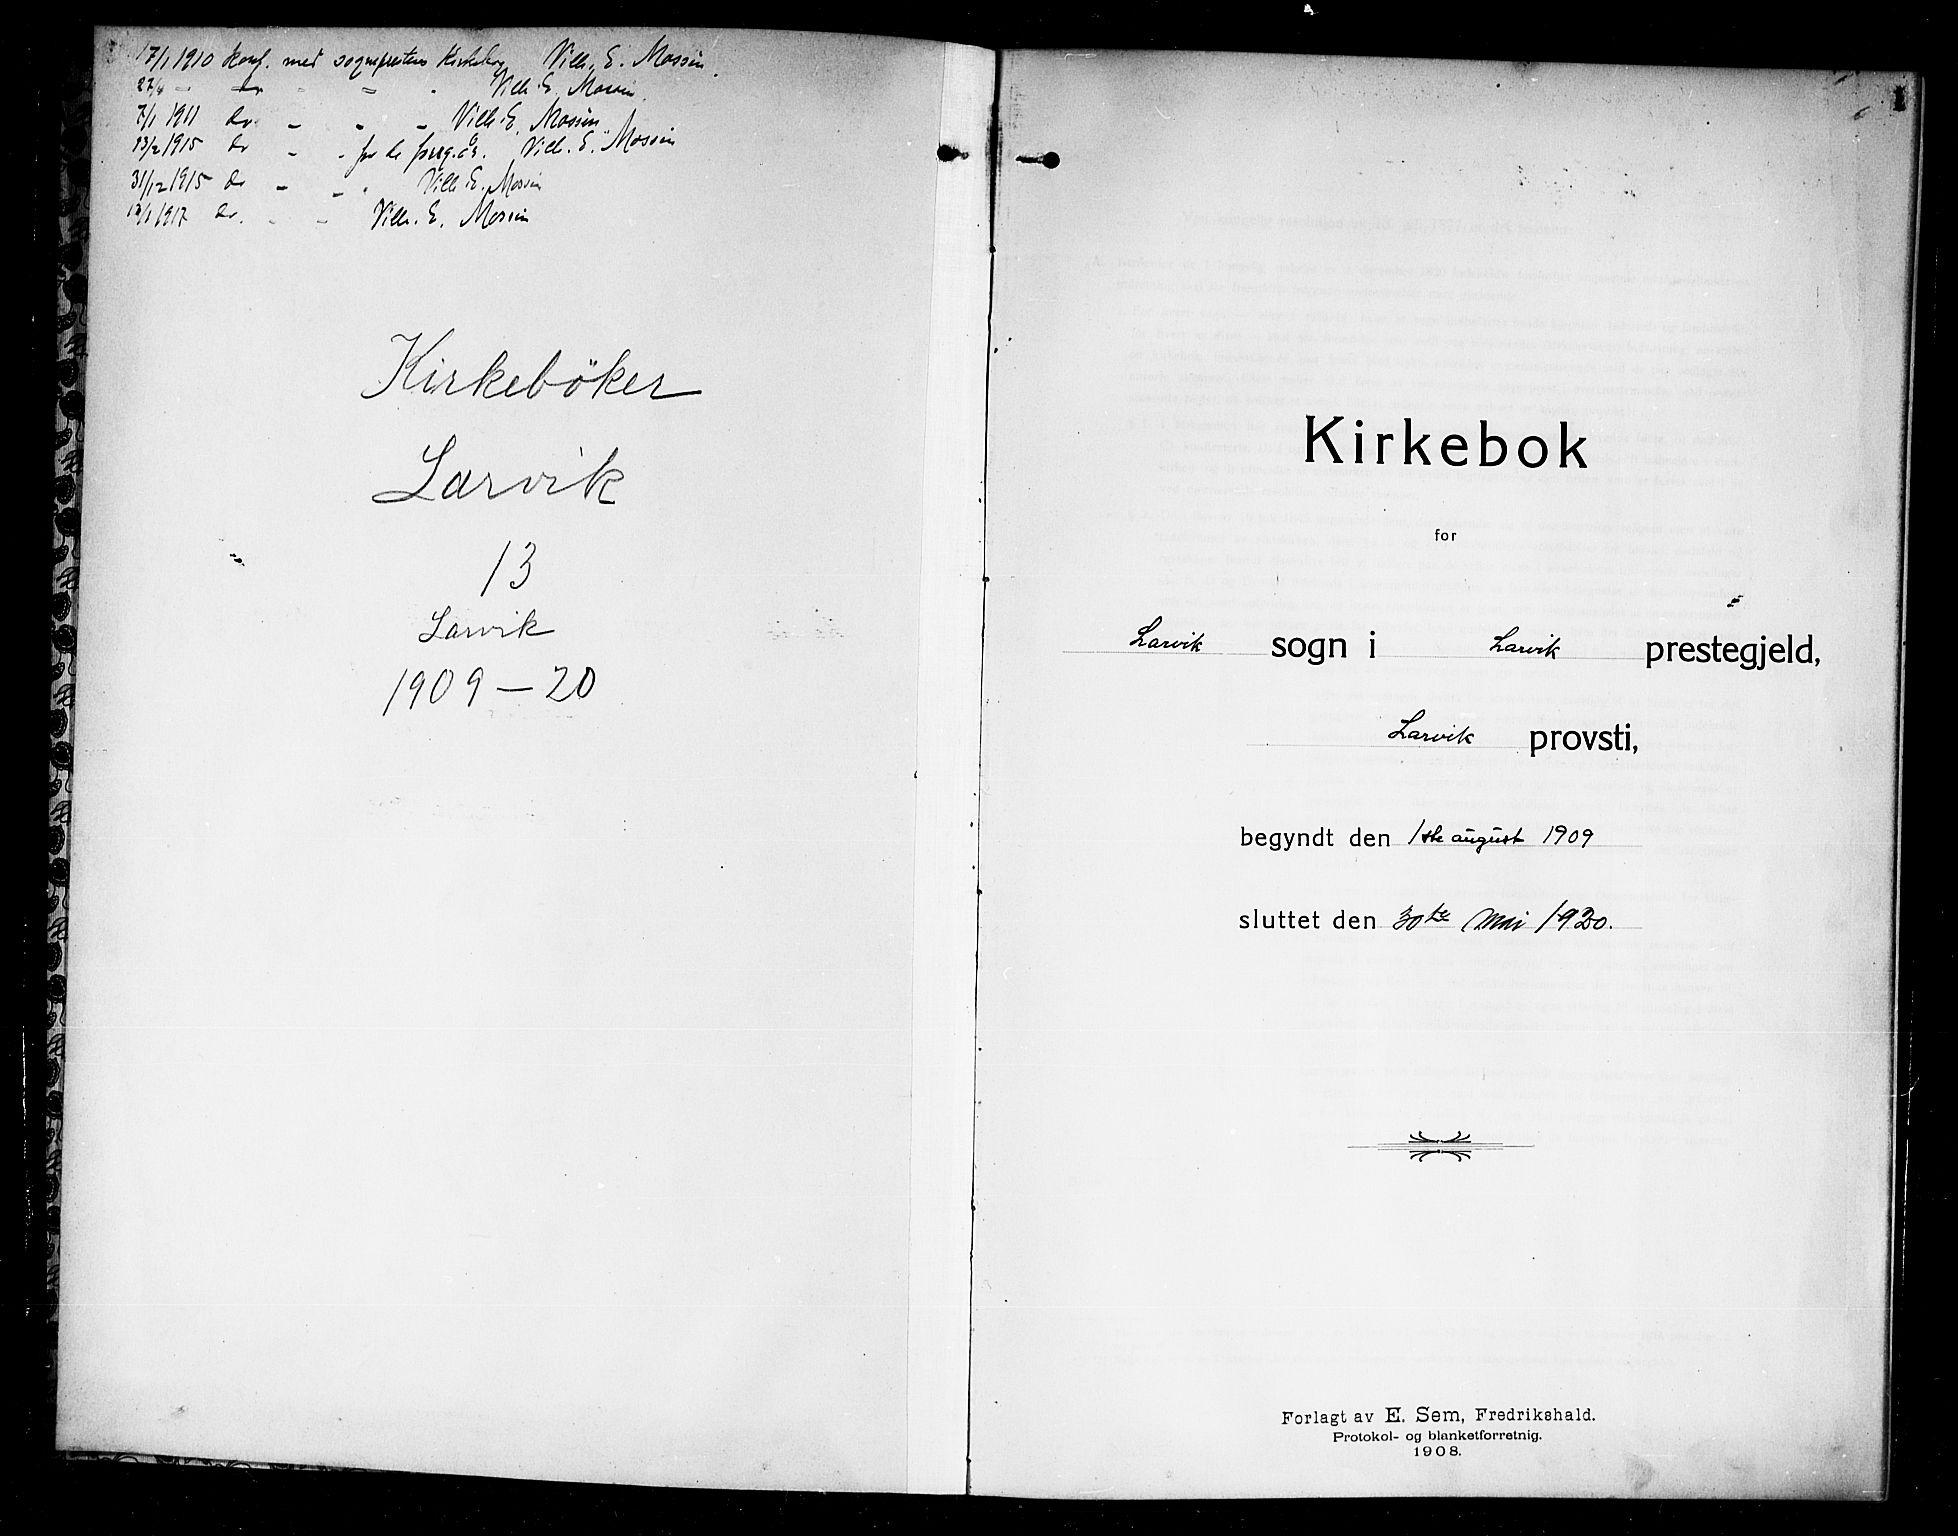 SAKO, Larvik kirkebøker, G/Ga/L0008: Klokkerbok nr. I 8, 1909-1920, s. 1